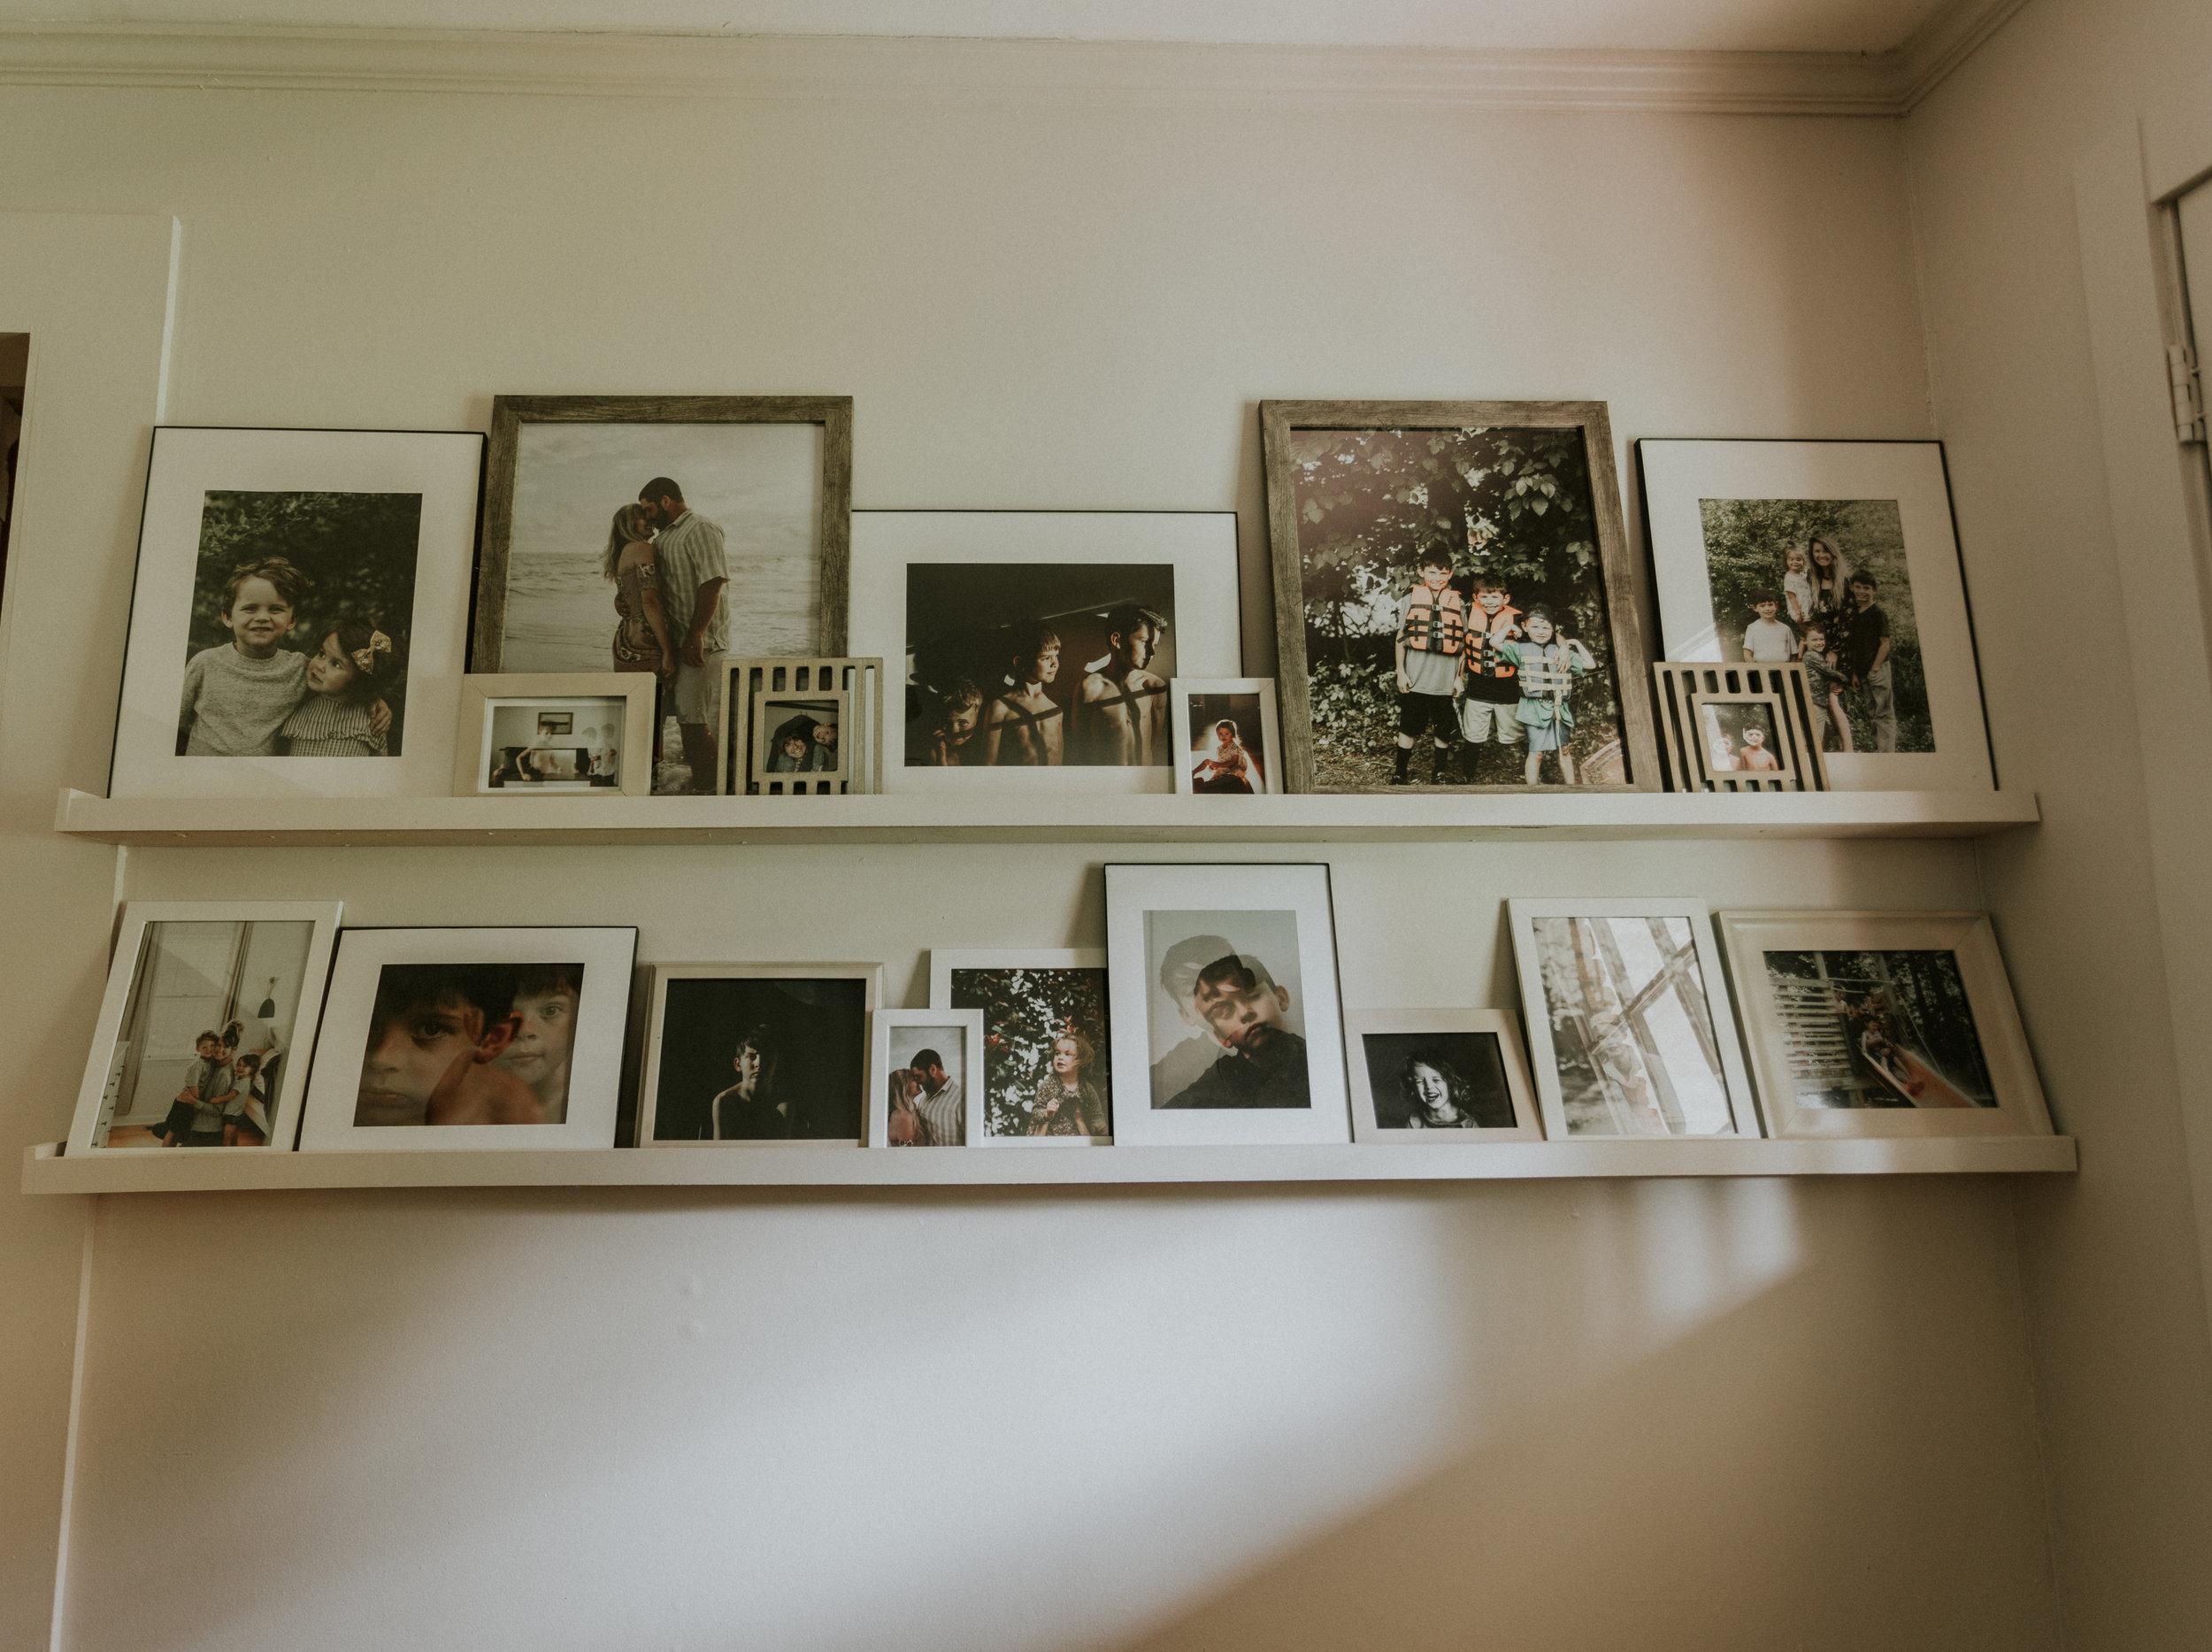 How to build a photo ledge on a budget